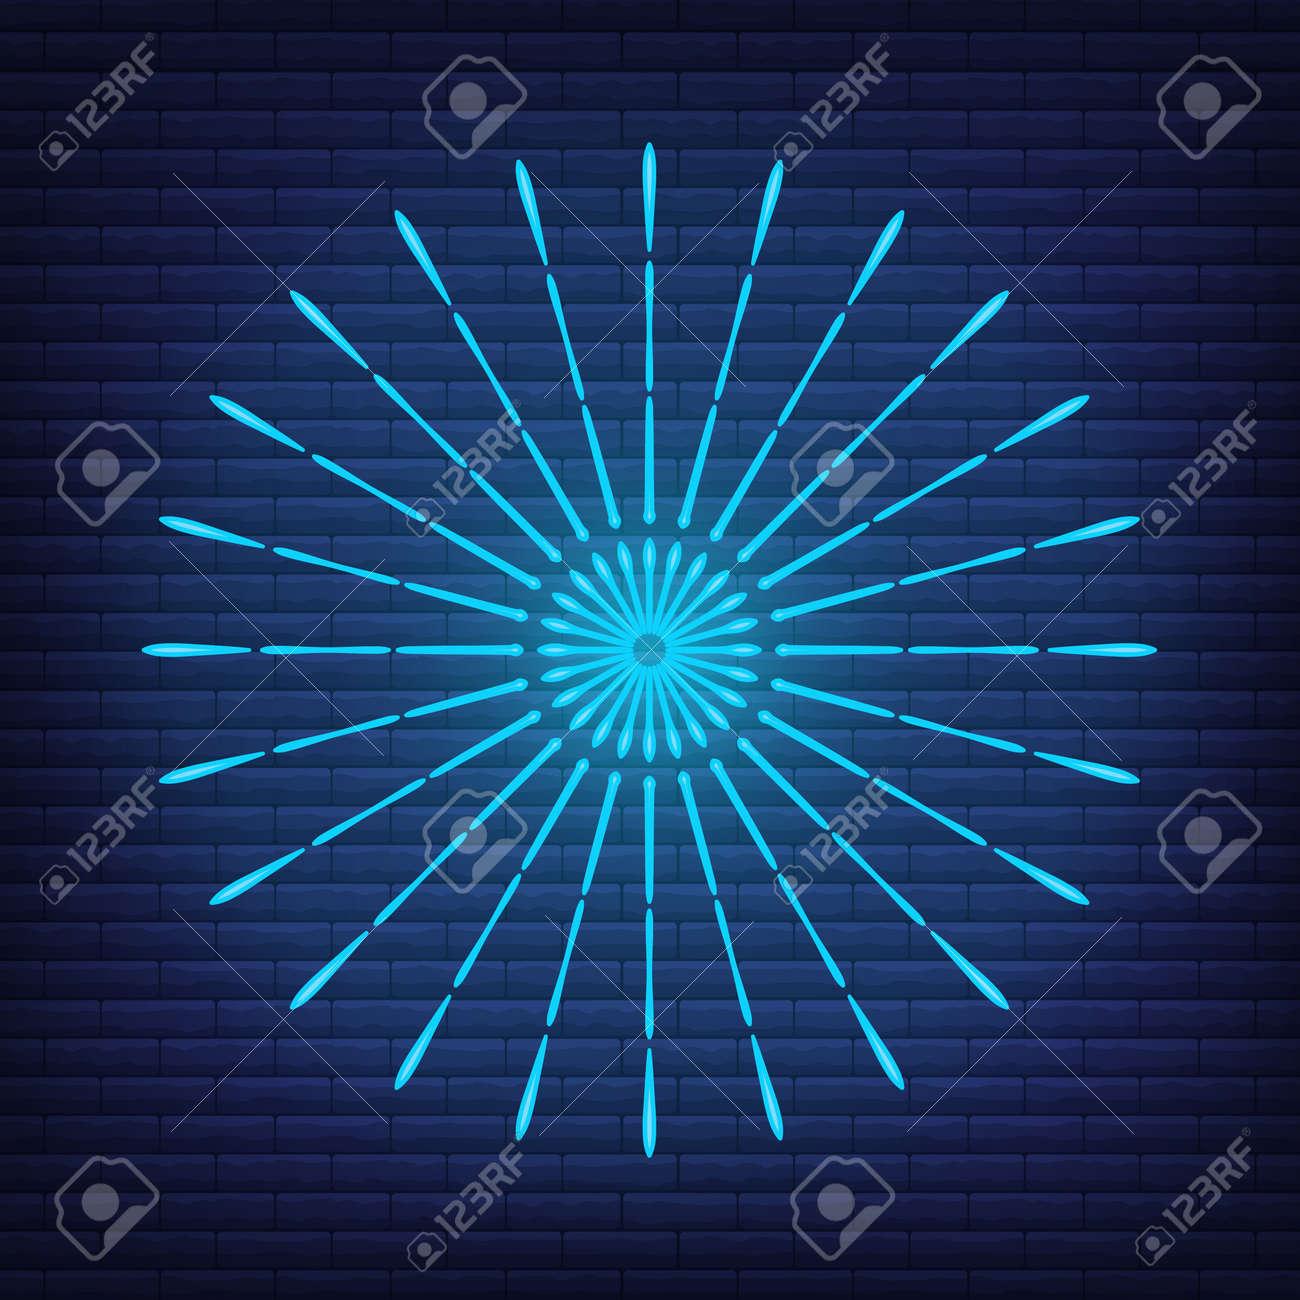 Retro design light sunburst neon style glow geometric shape, vintage rays sunlight explosion icon concept vector illustration, isolated on black wall. Minimal blue firework burst label, sunbeam badge. - 168394818